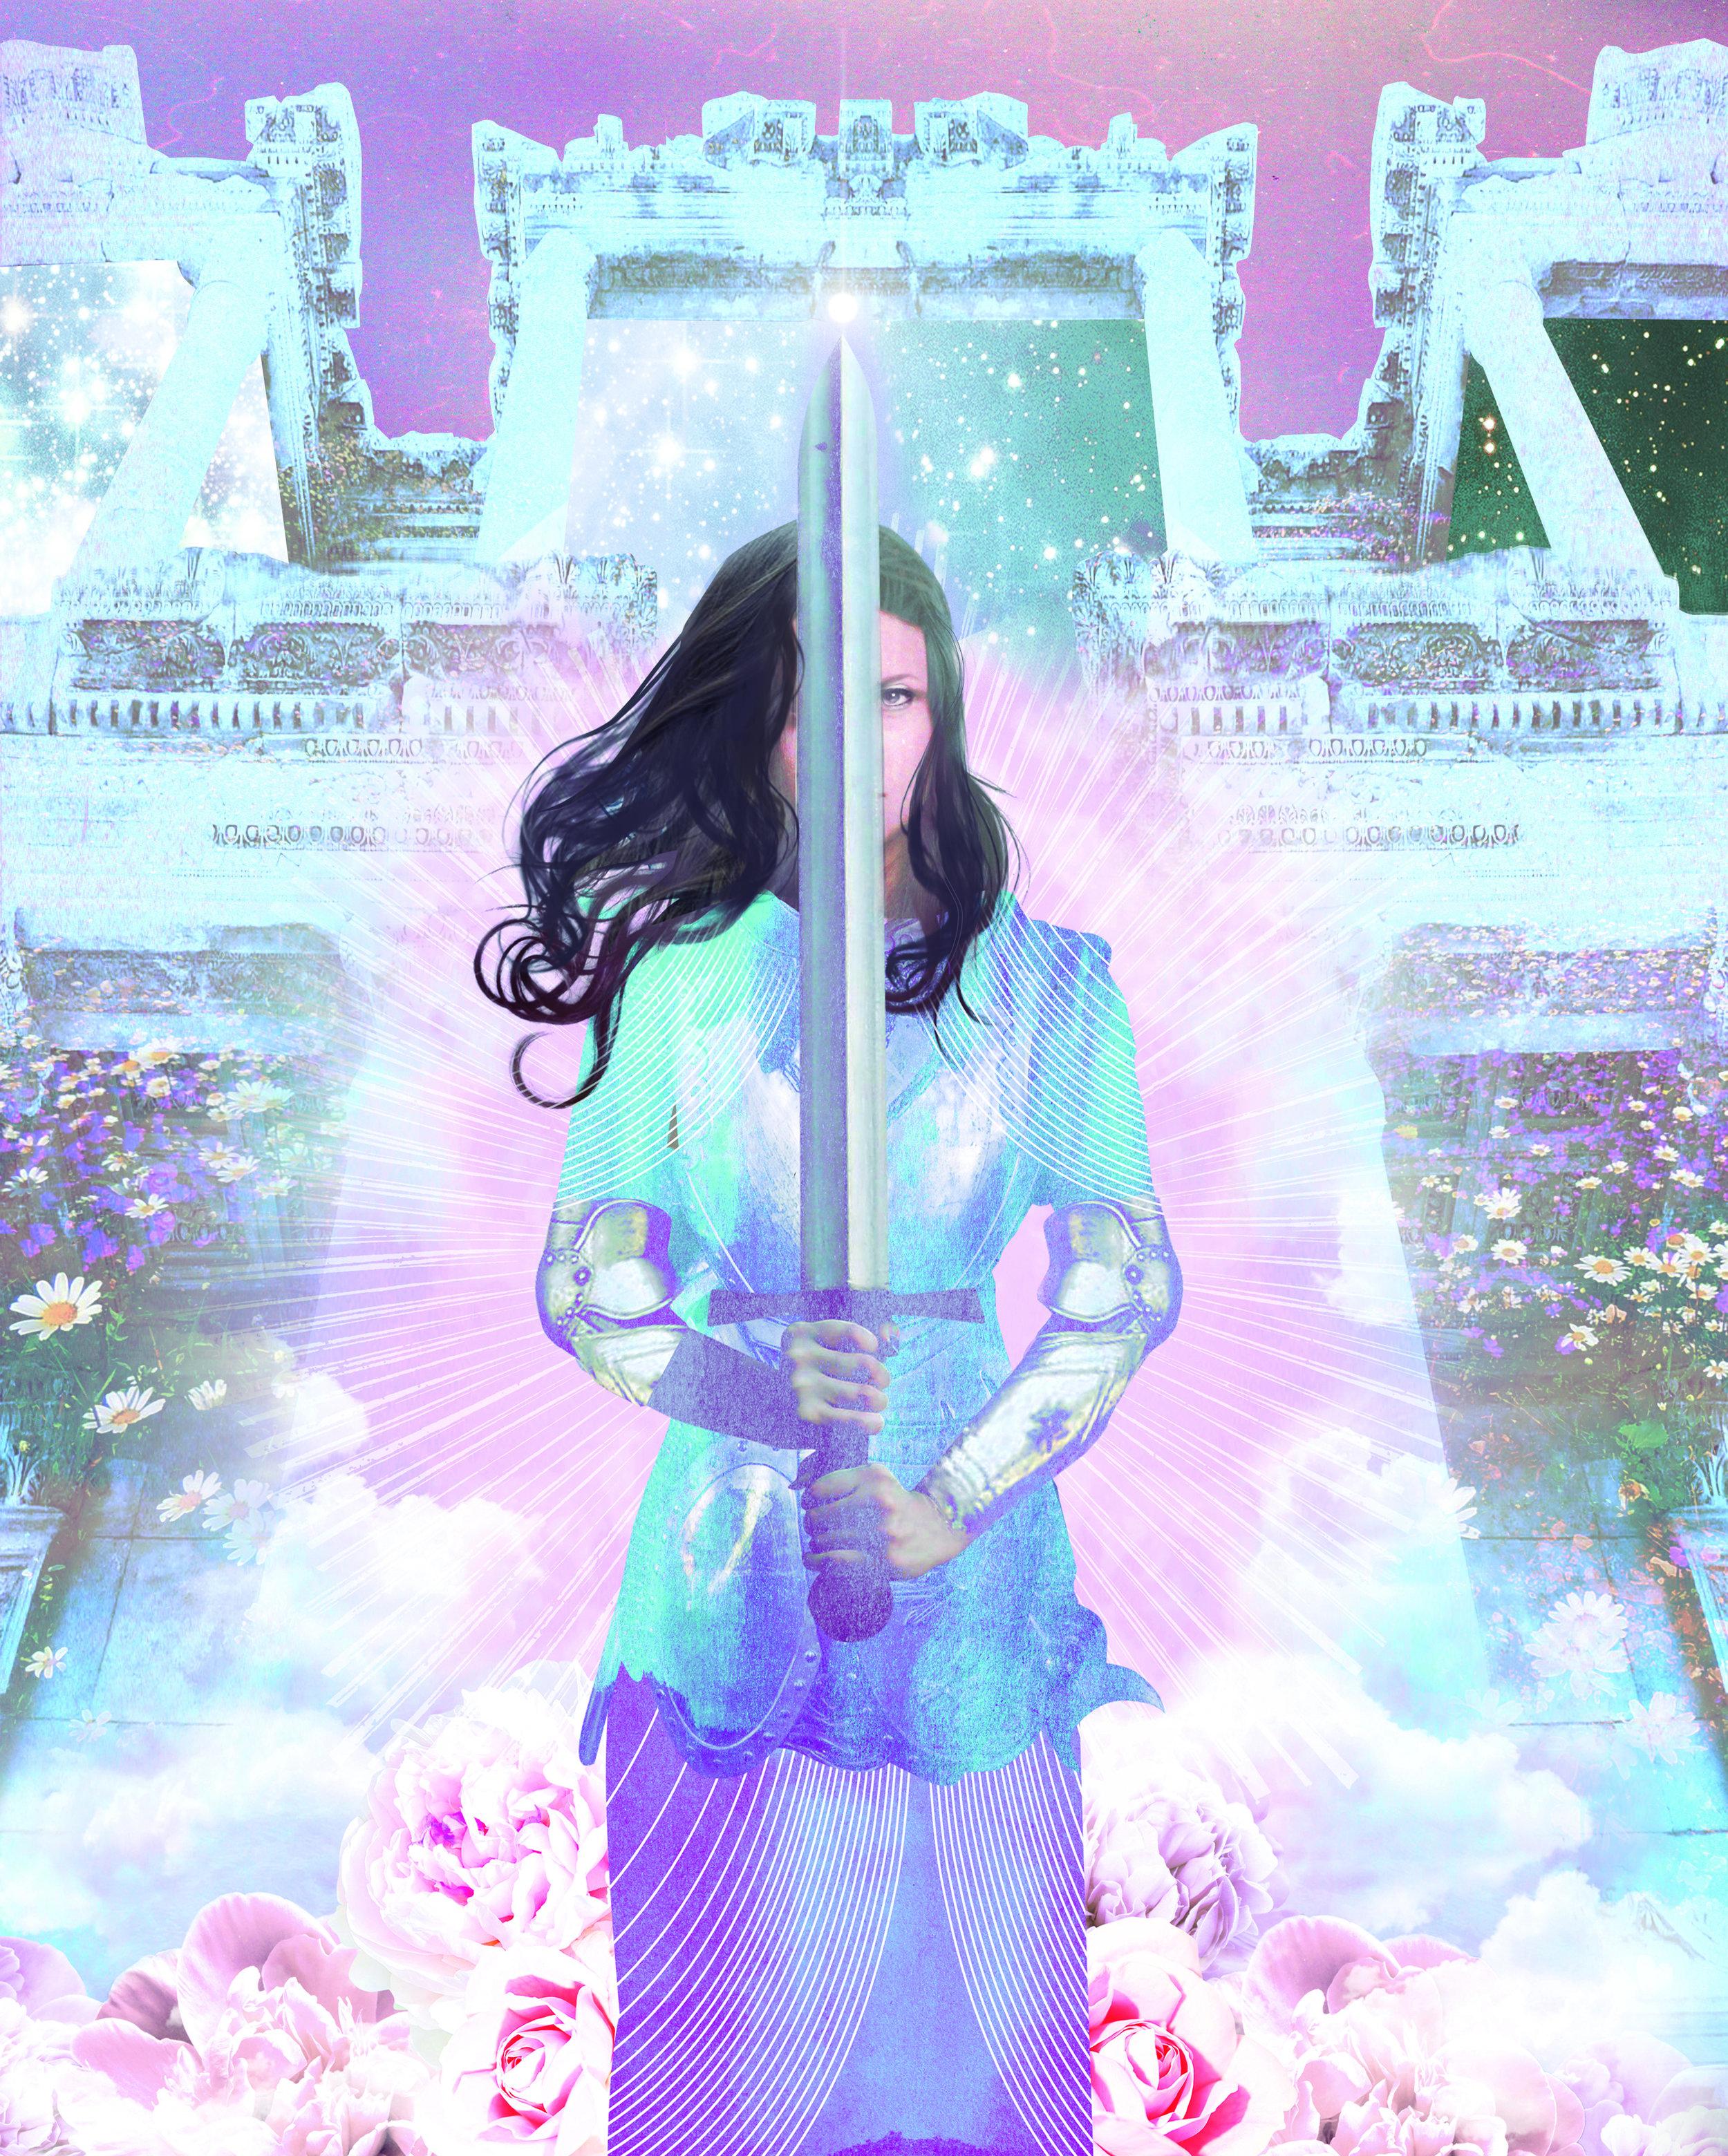 11-WARRIOR-WOMAN copy.jpg